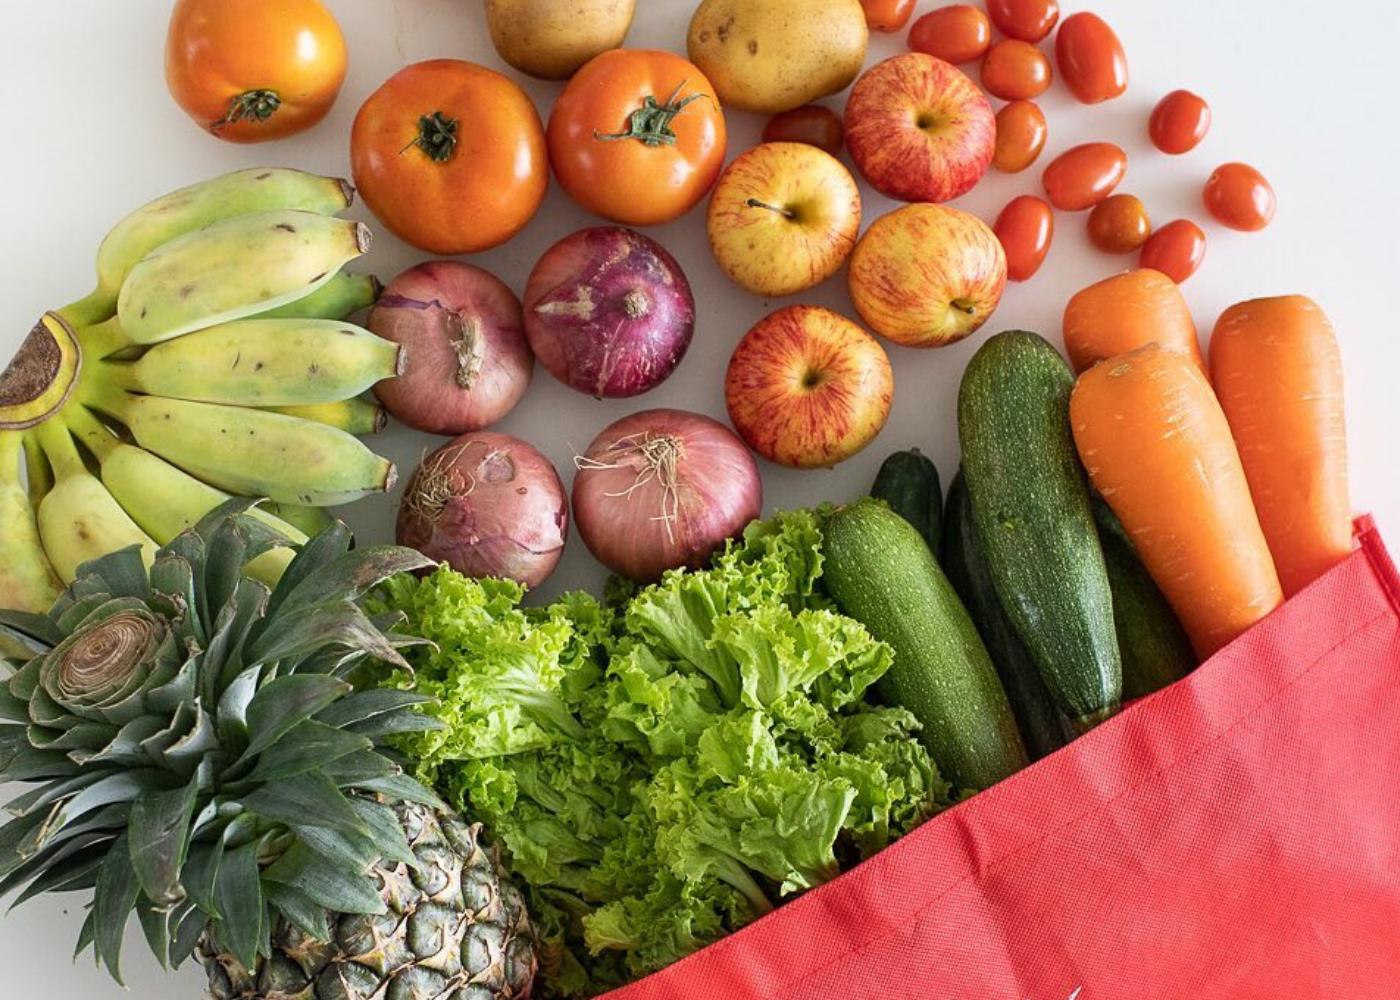 Online grocery shopping: Shiok Farm